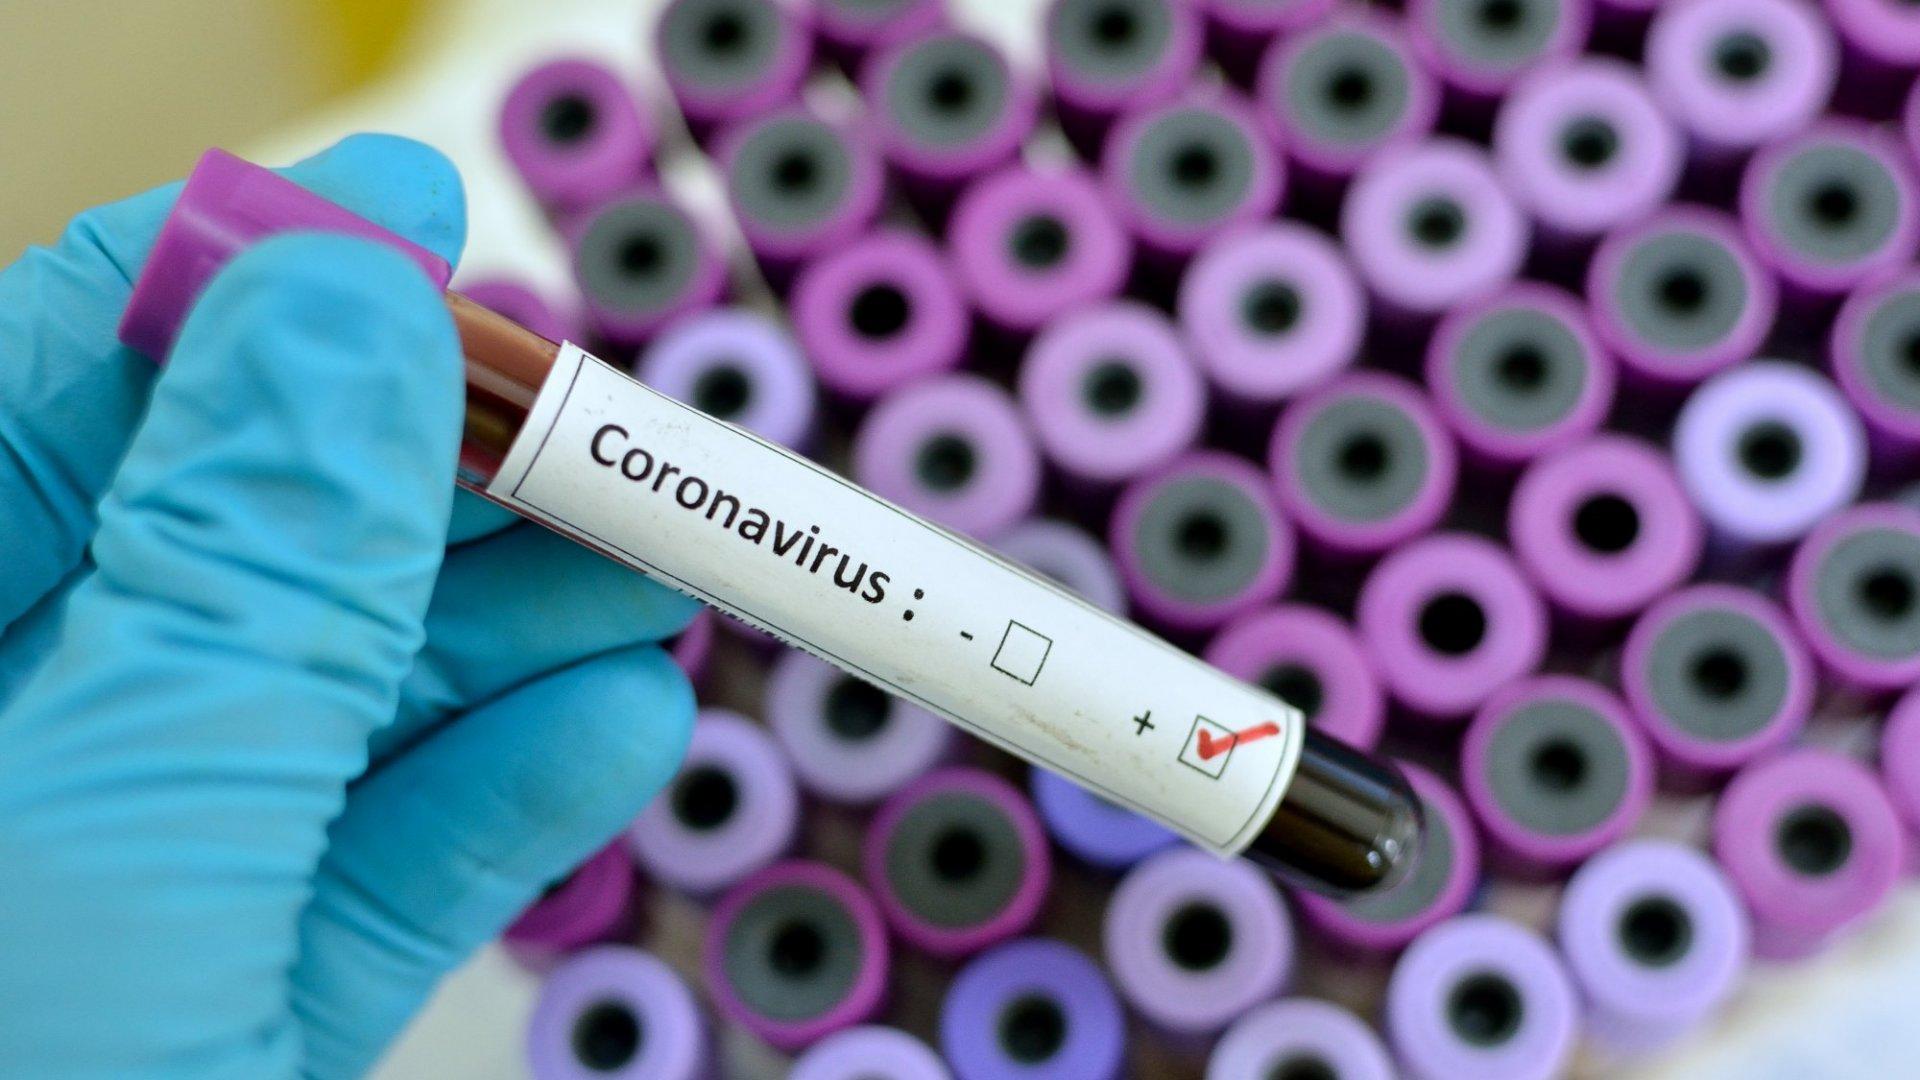 Fake Coronavirus Posts Show How Big Tech Fails at Containing Harmful Information